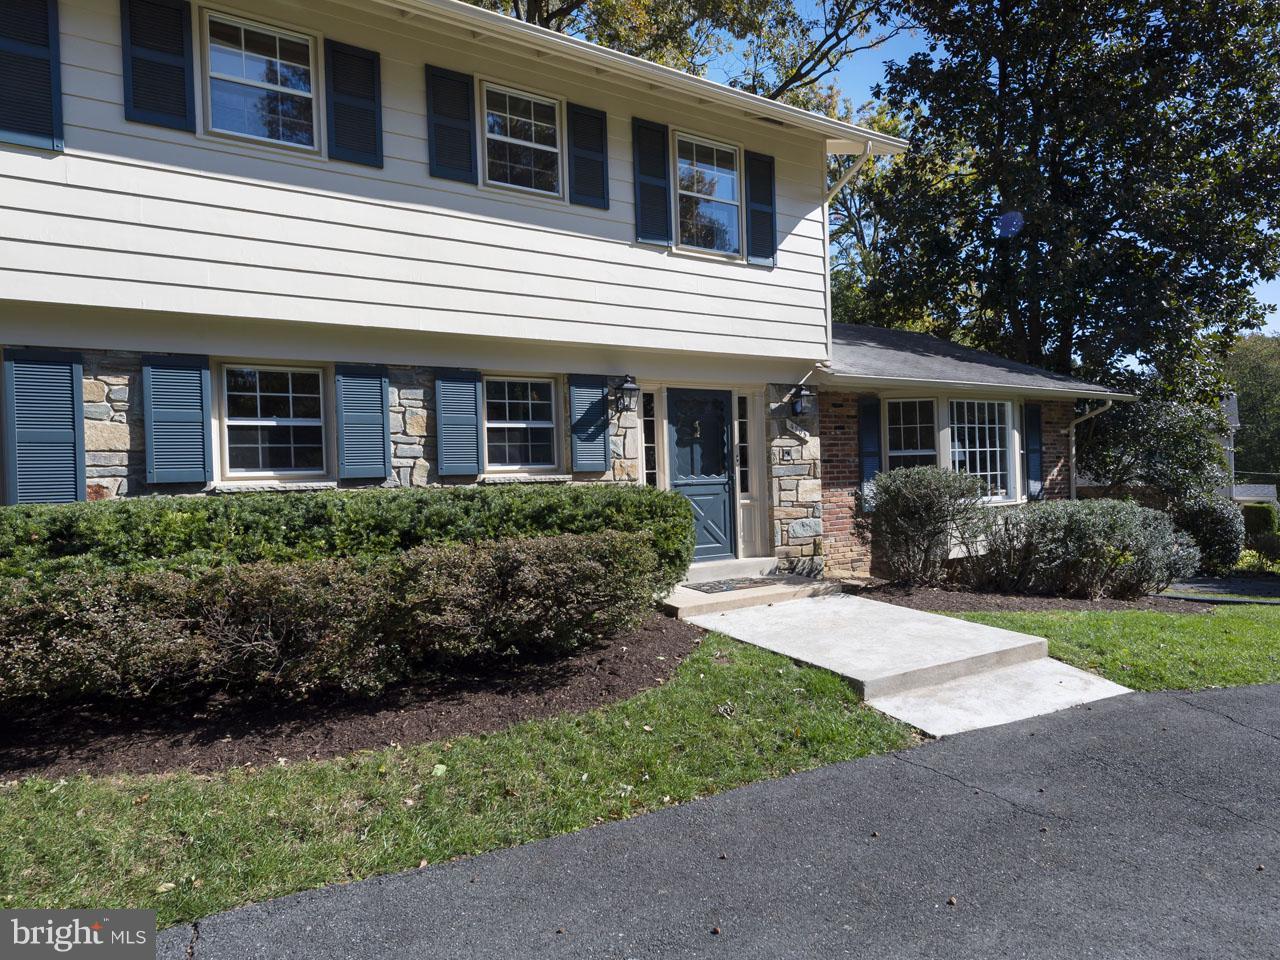 1010014728-300953034831-2021-09-05-13-50-27  |   | Annandale Delaware Real Estate For Sale | MLS# 1010014728  - Best of Northern Virginia